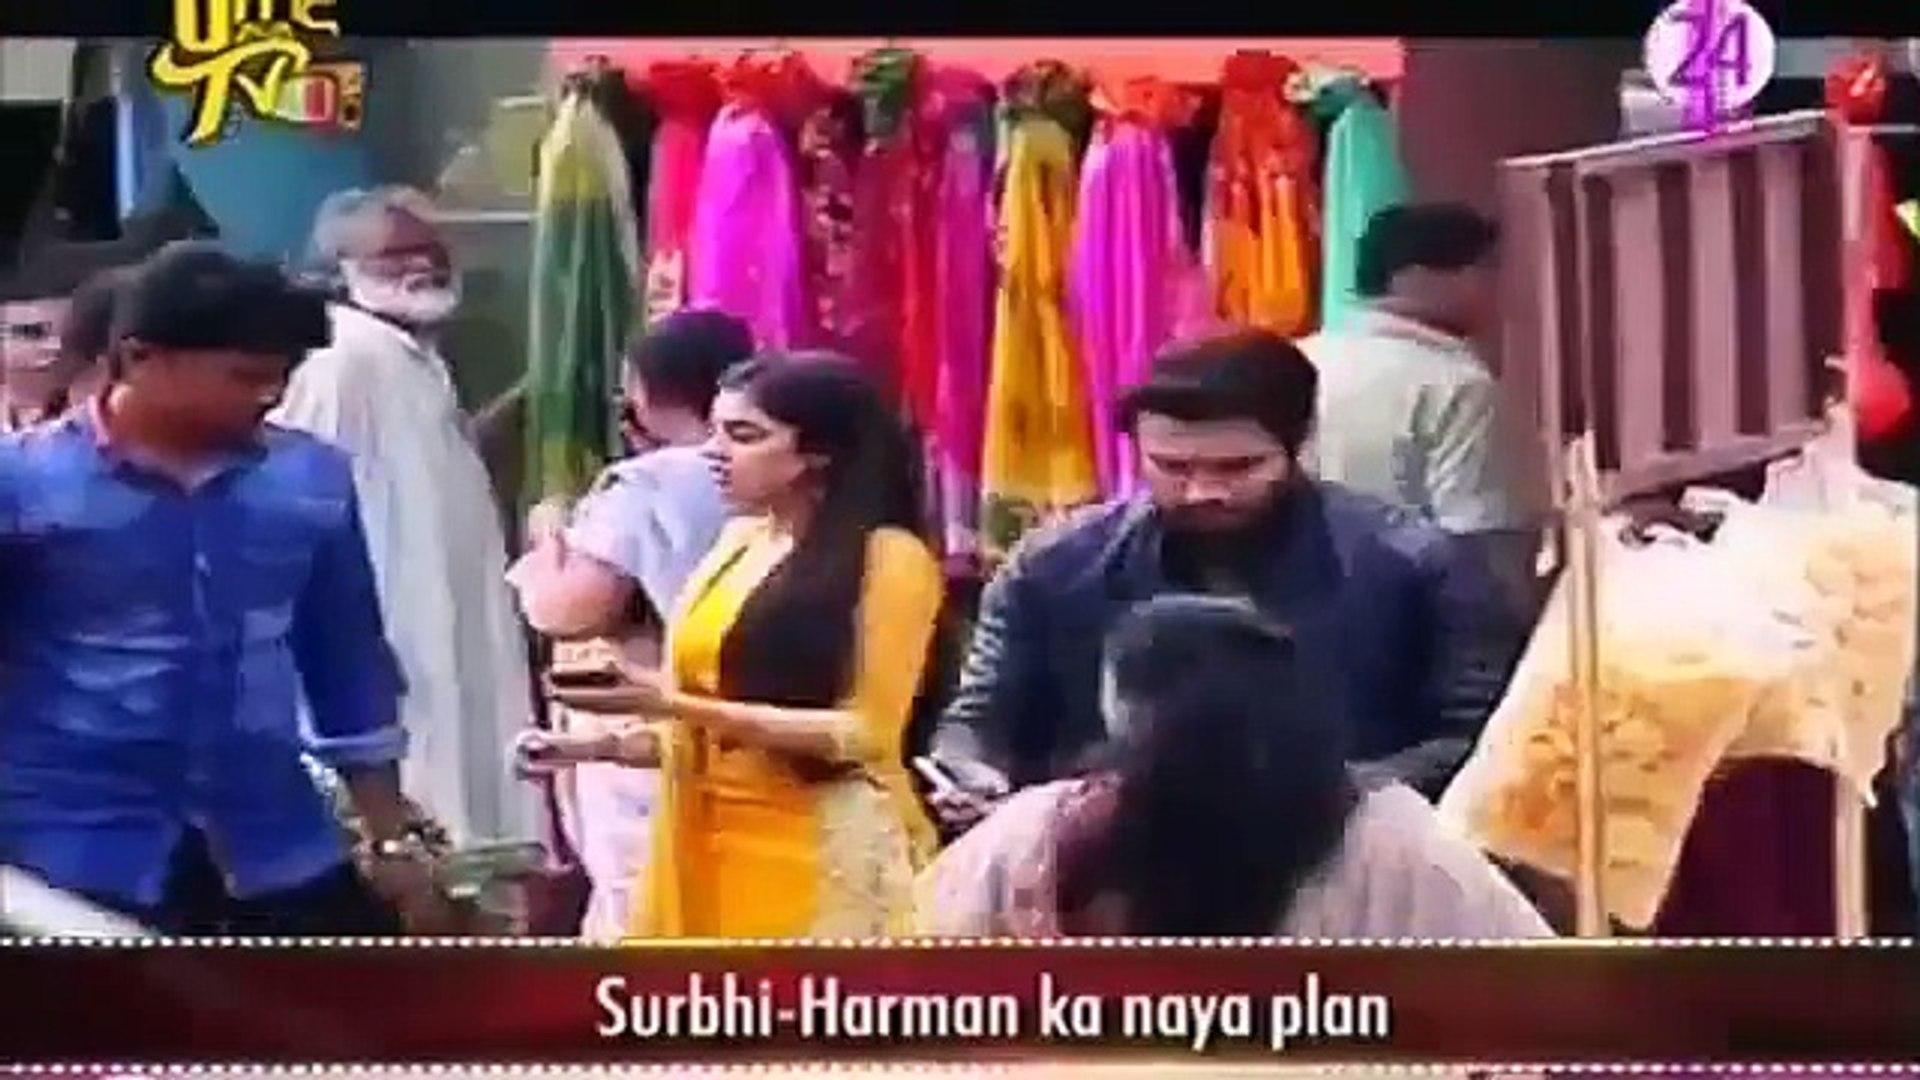 Shakti 19 October 2016 19 October 2016 | Latest Updates |  Colors Tv Serials Hindi Drama News 2016